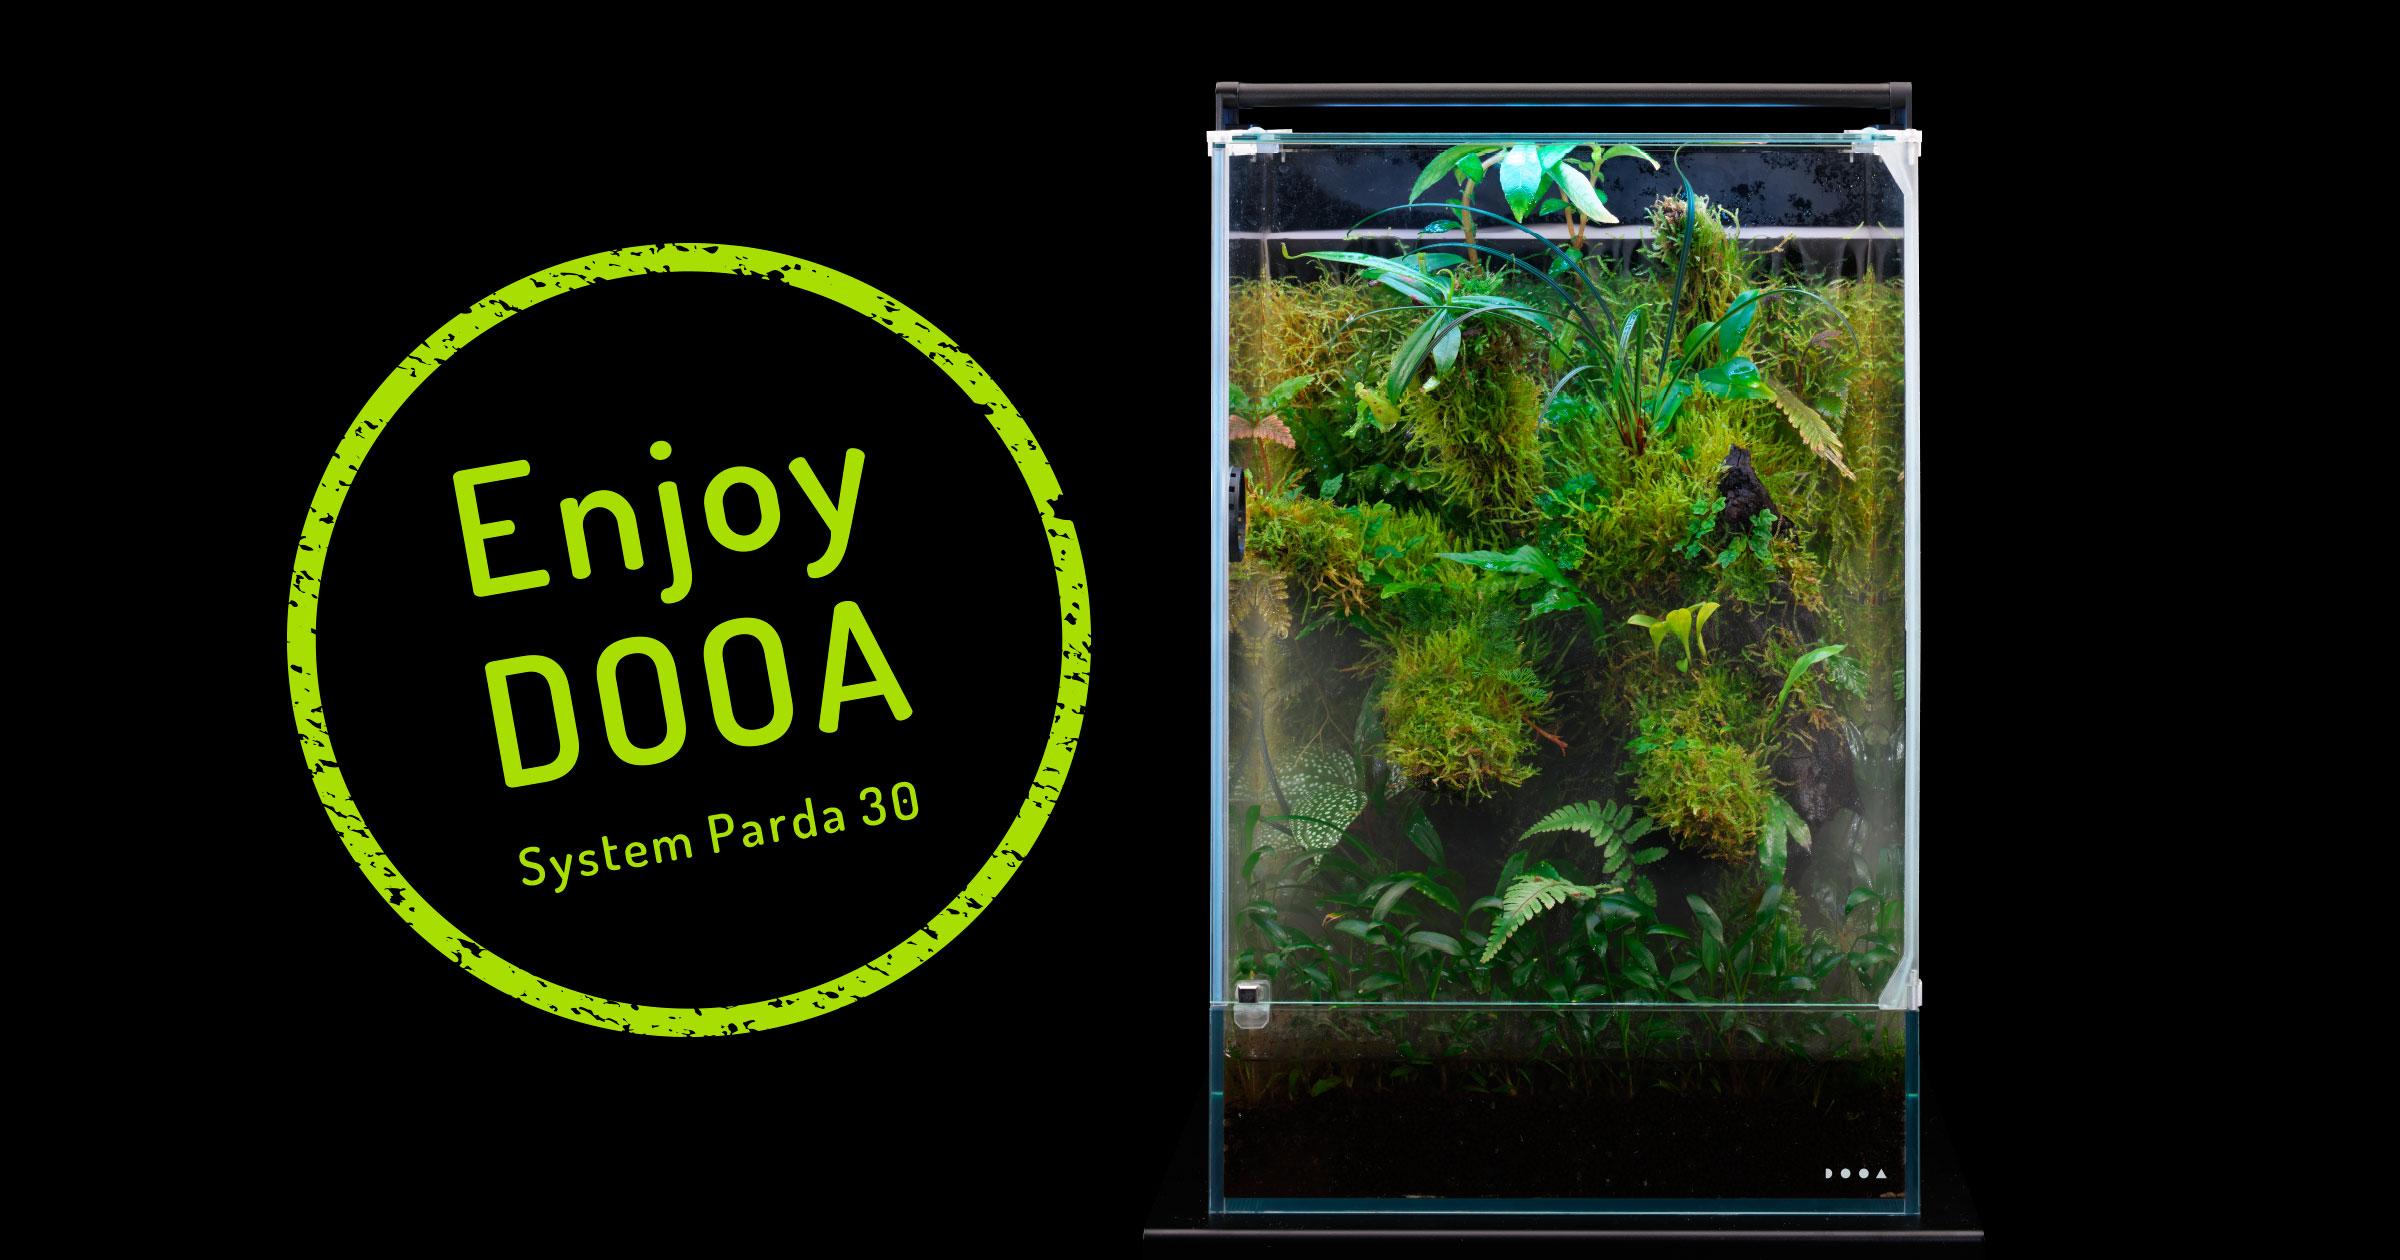 Enjoy DOOA 'System Paluda 30'